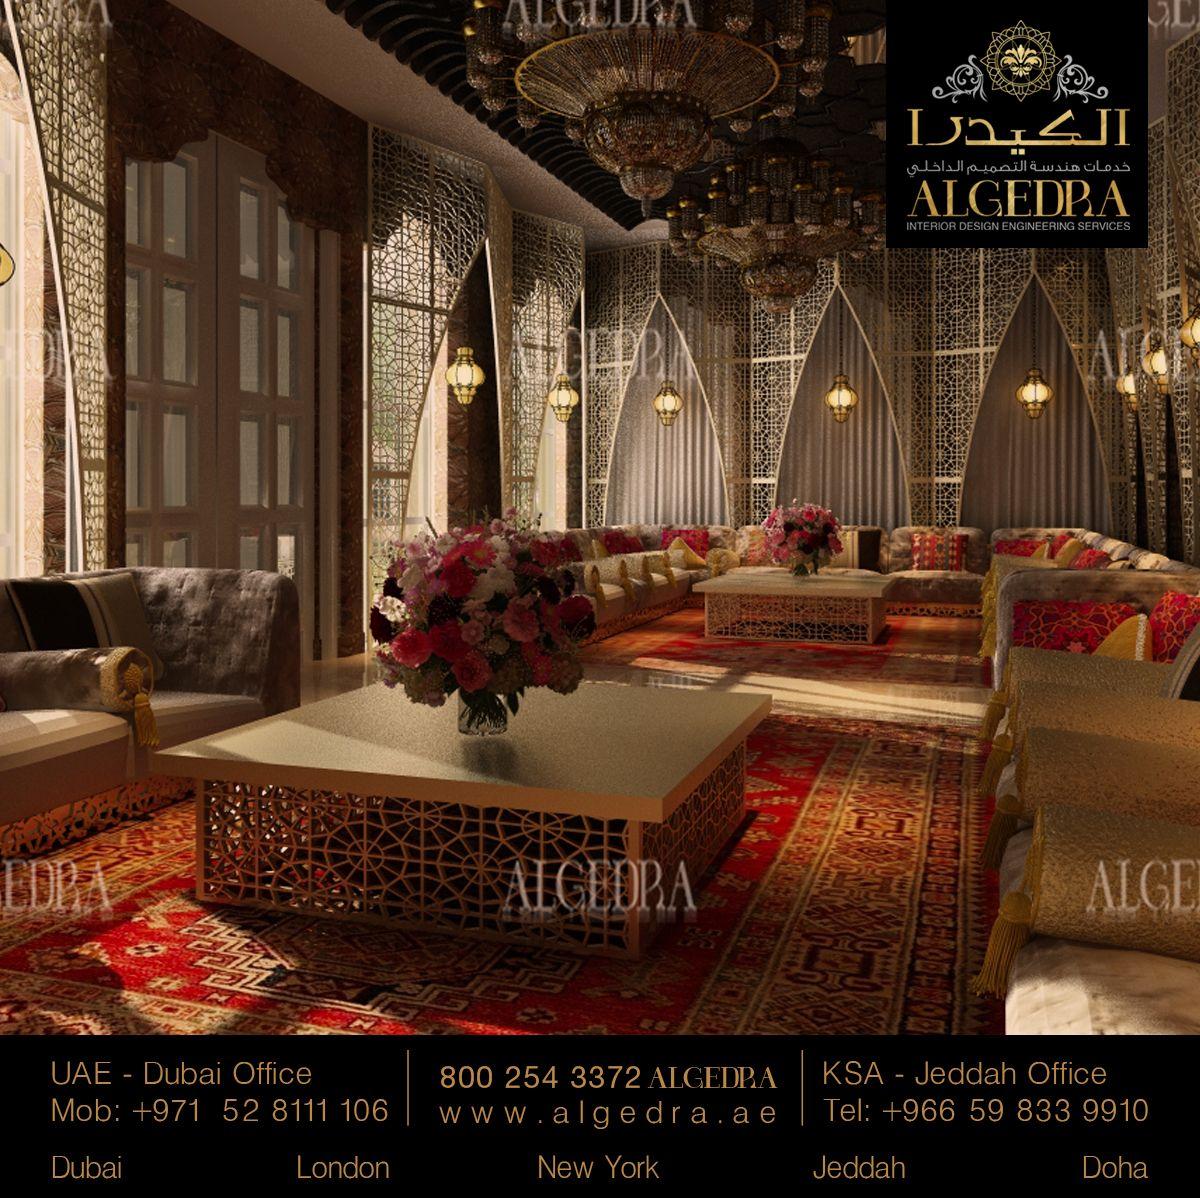 Call Us For Free Consultation Algedra Residential Interior DesignInterior